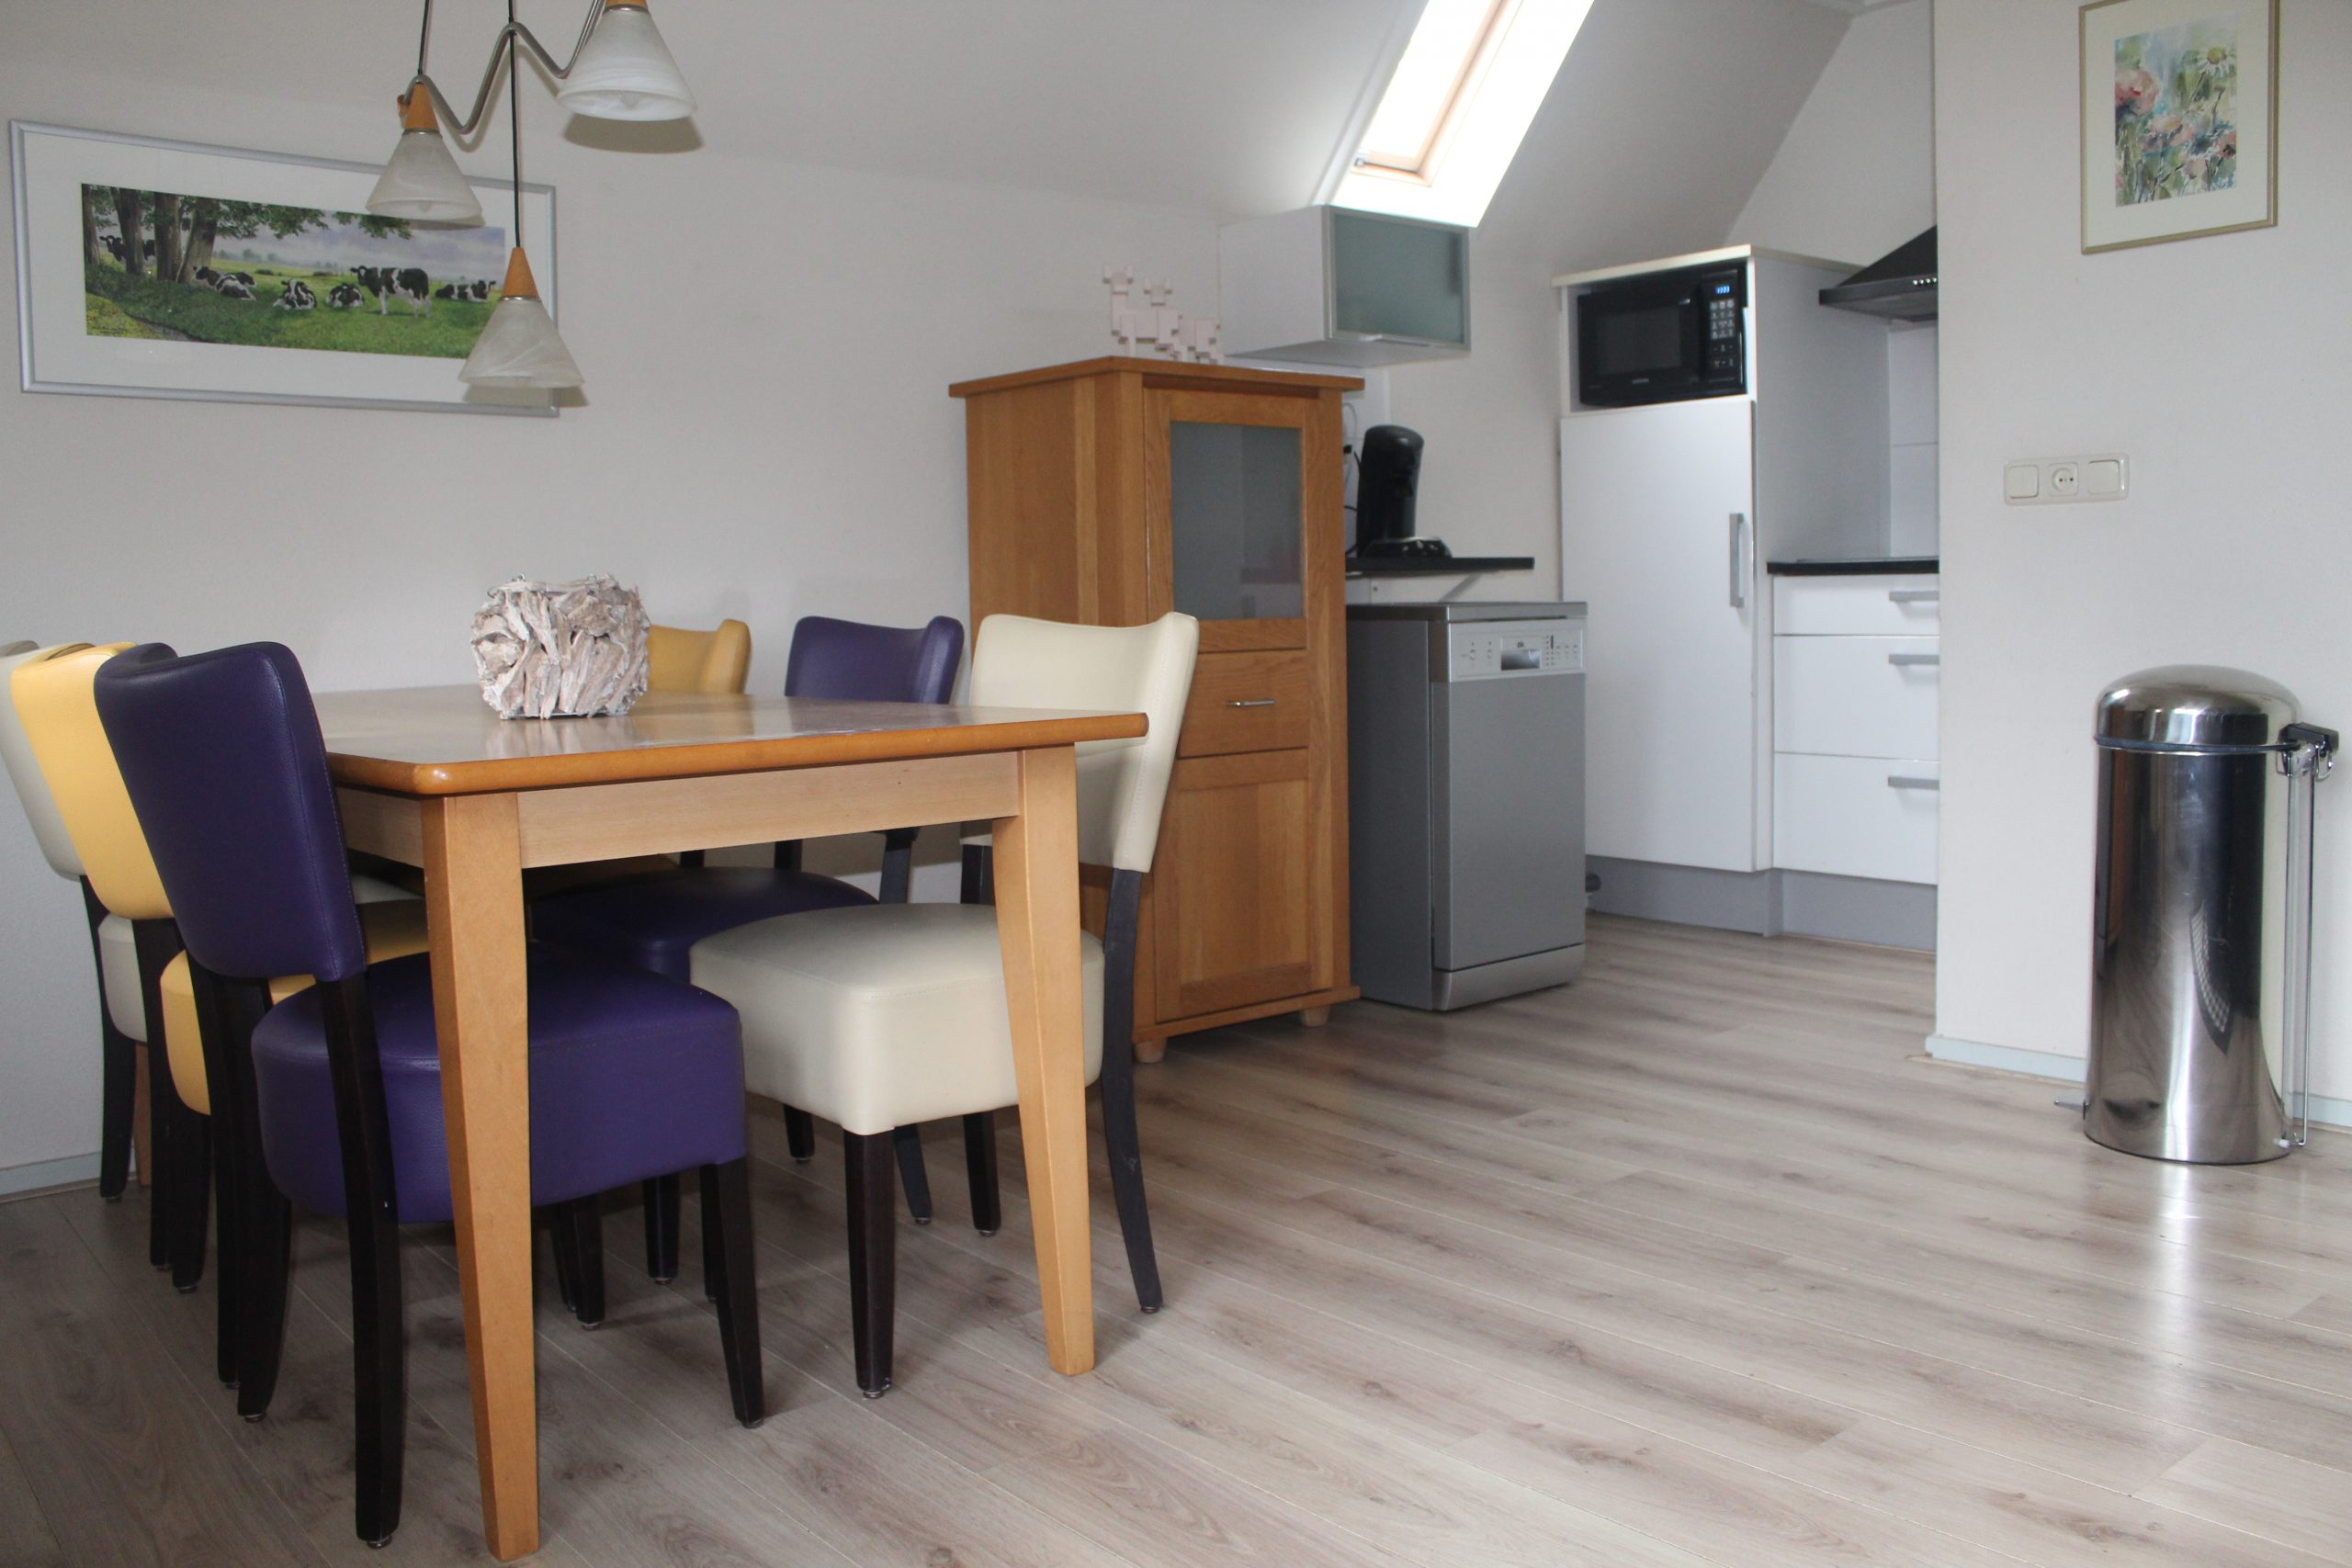 Eetkamer keuken Lauwersmeer